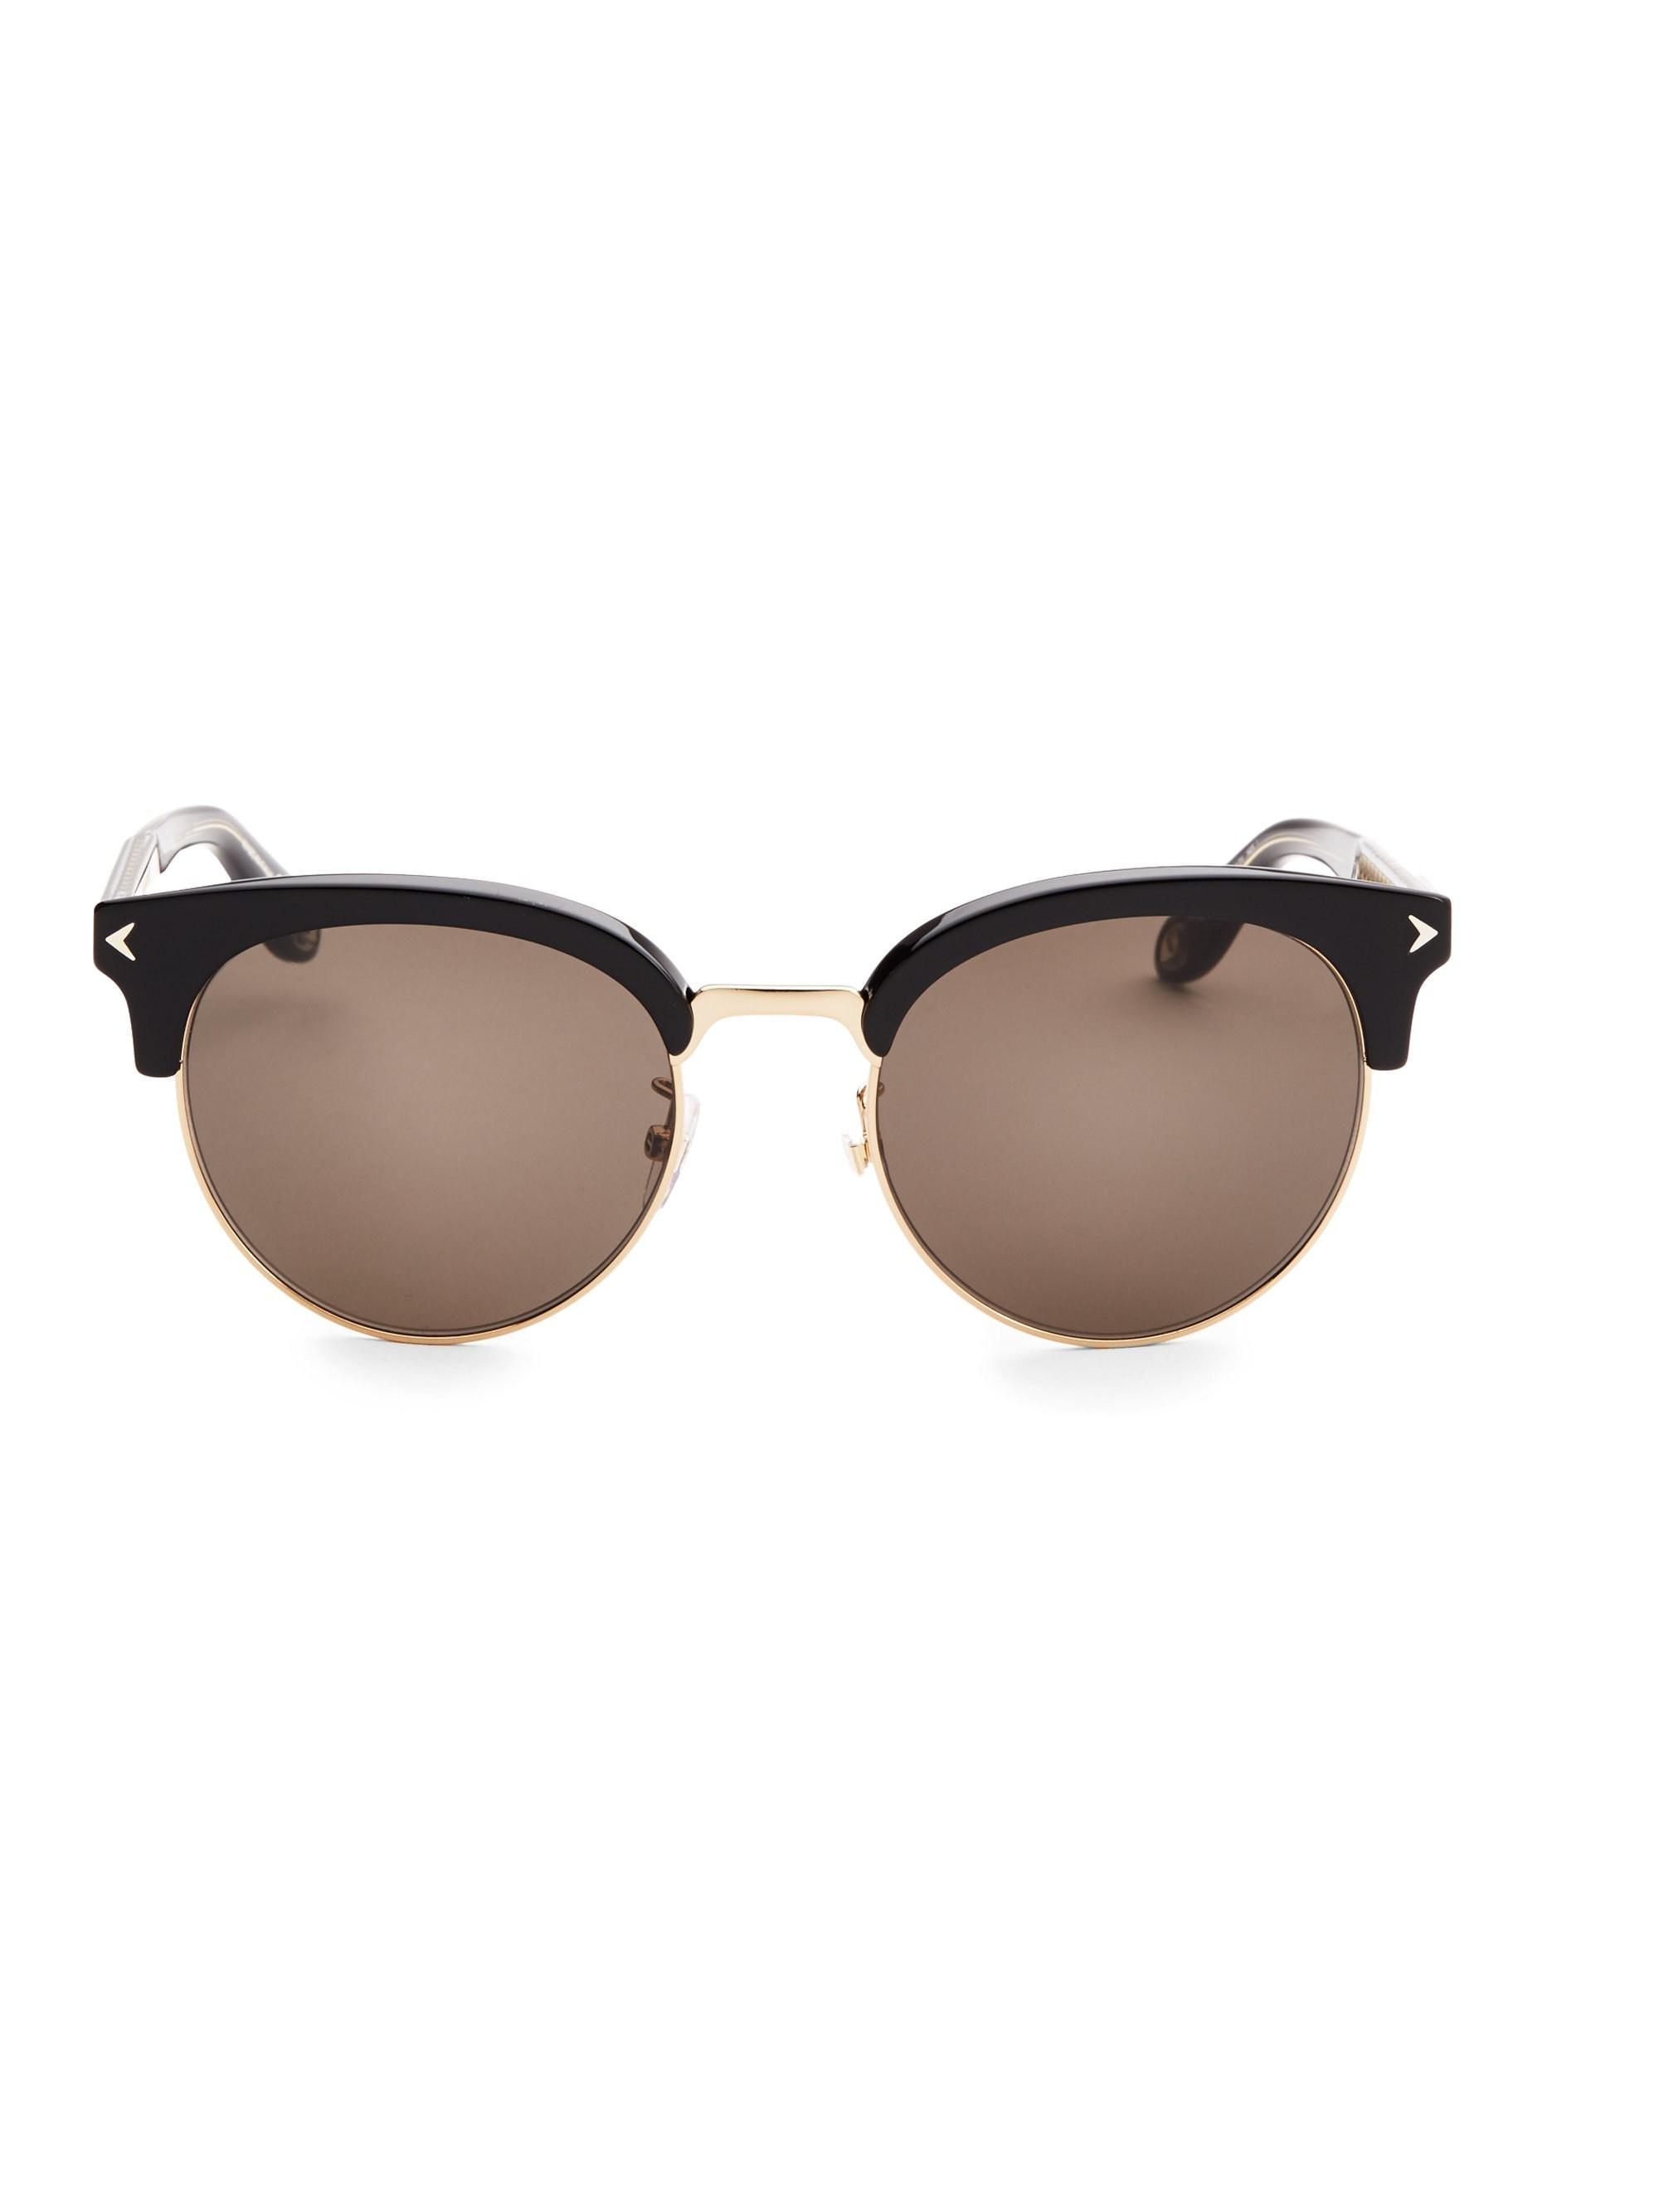 47f09ec3f39f Givenchy 55mm Half-rim Round Sunglasses in Black - Lyst